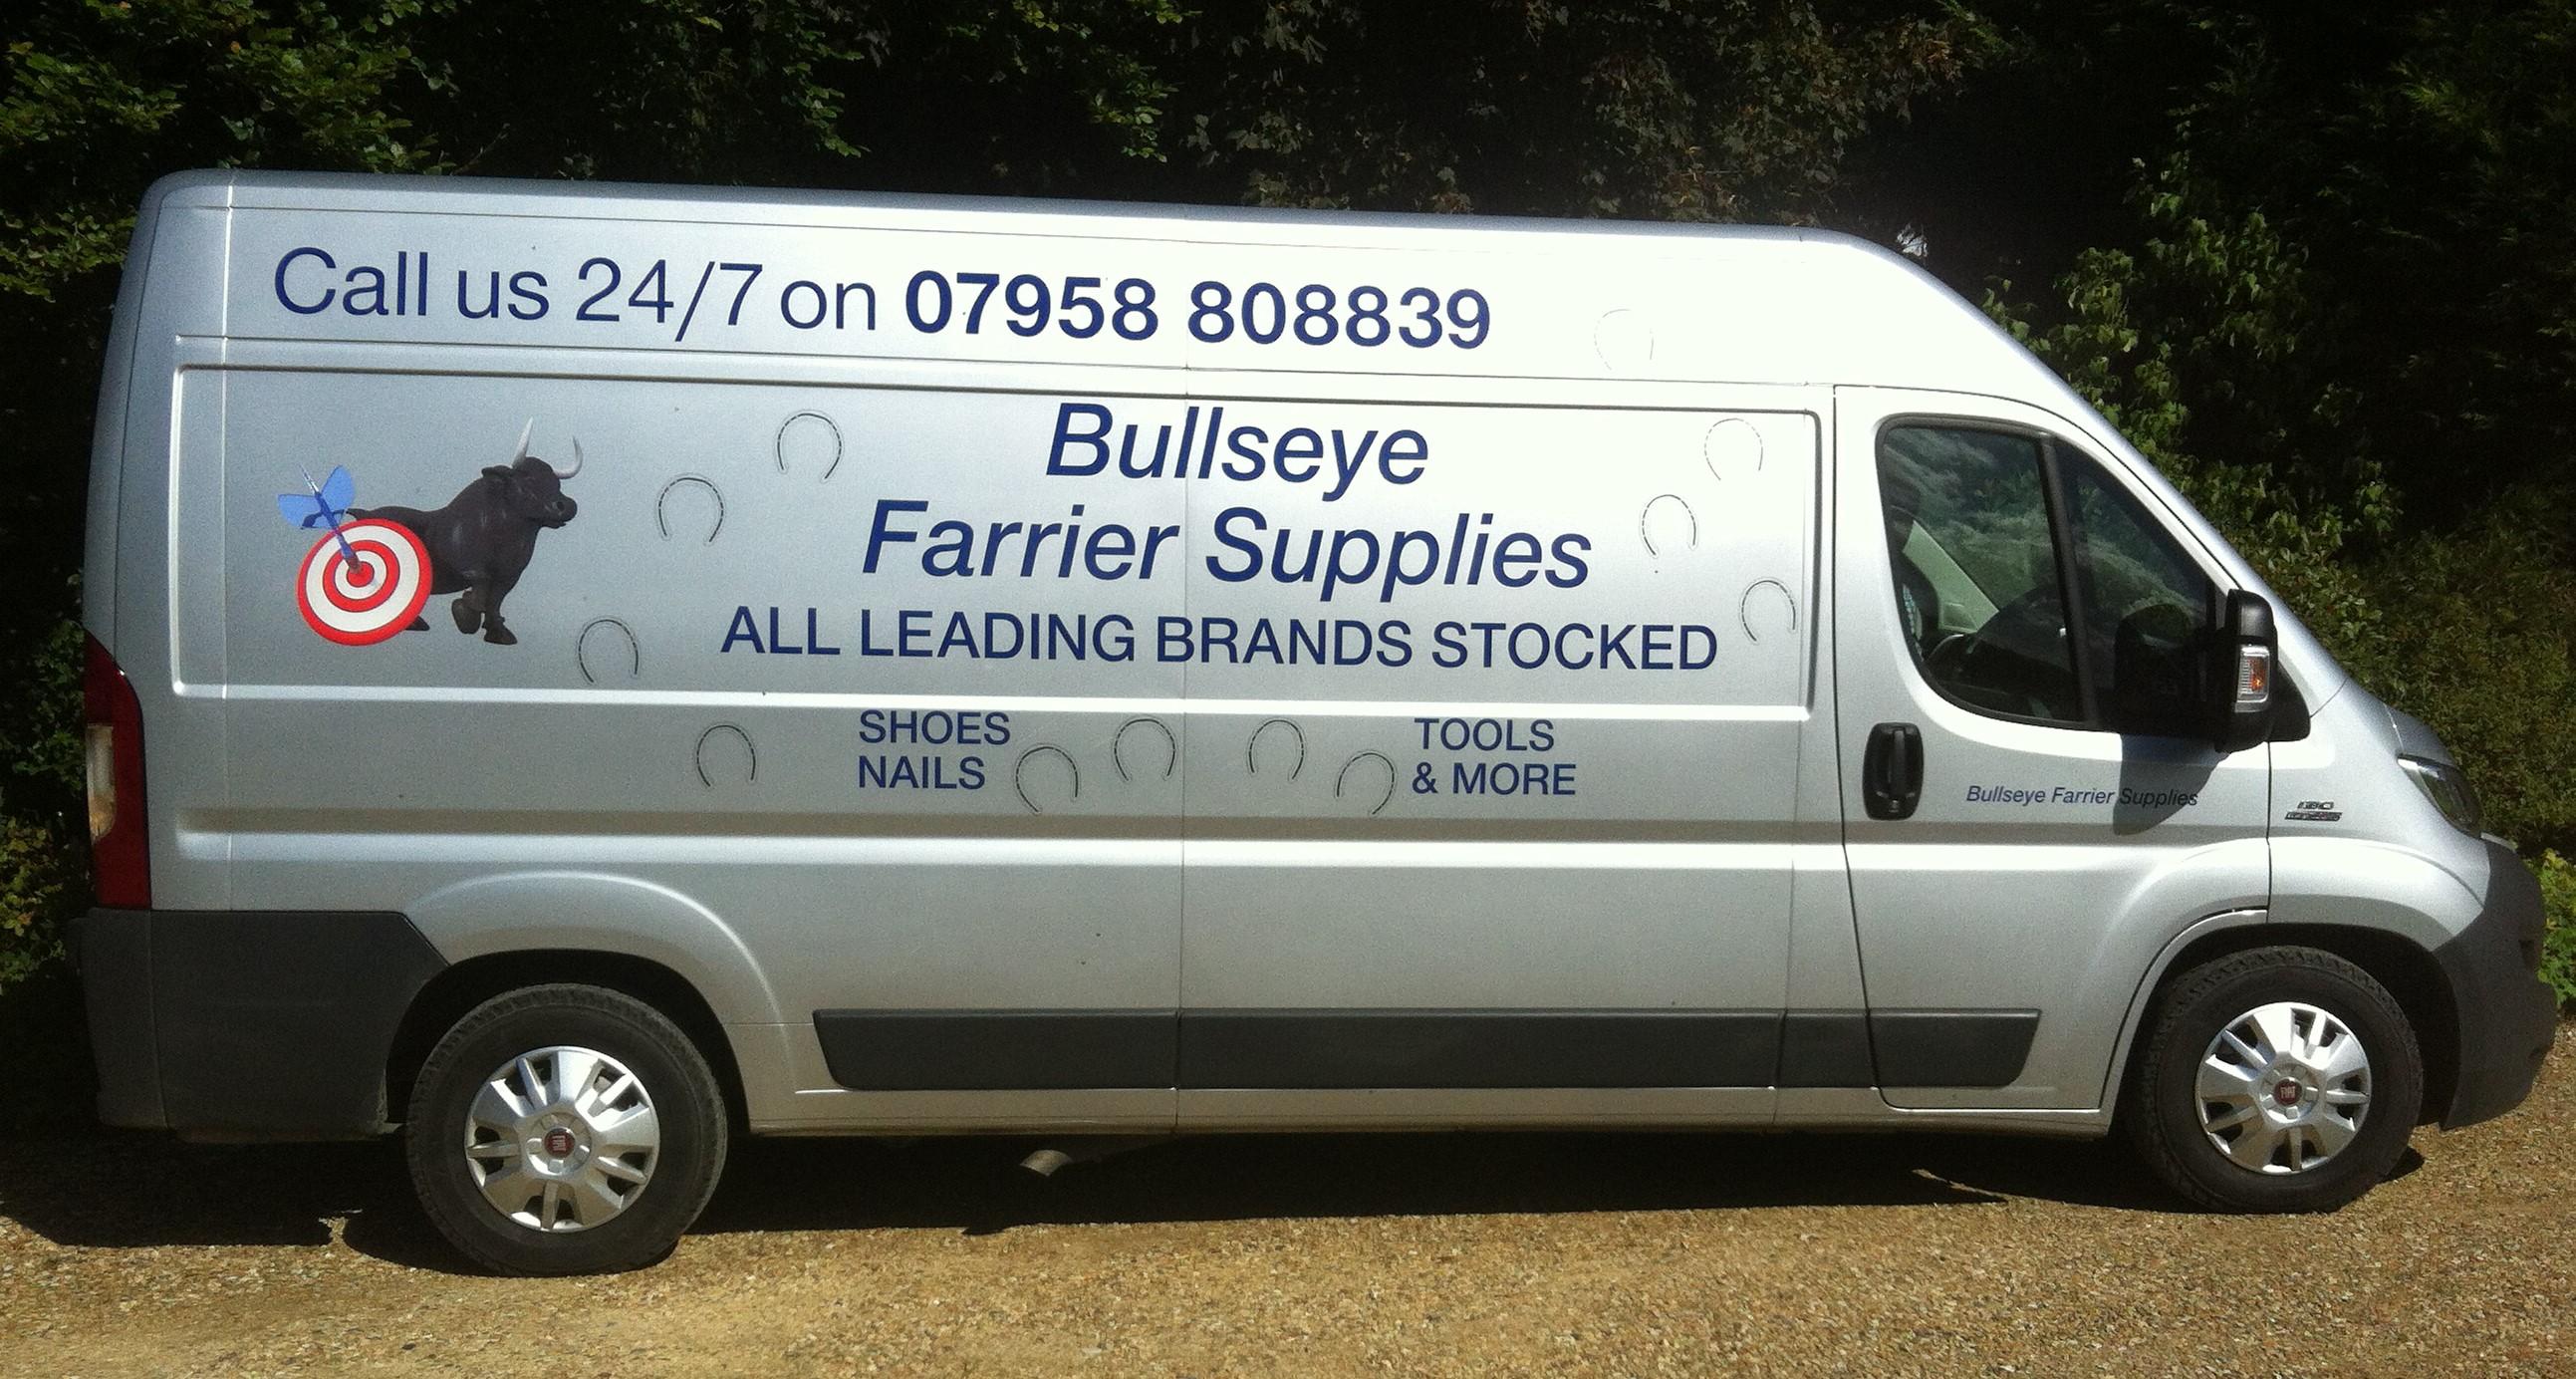 Bullseye Farrier Supplies - Romsey, Hampshire SO51 6FJ - 01794 324650 | ShowMeLocal.com